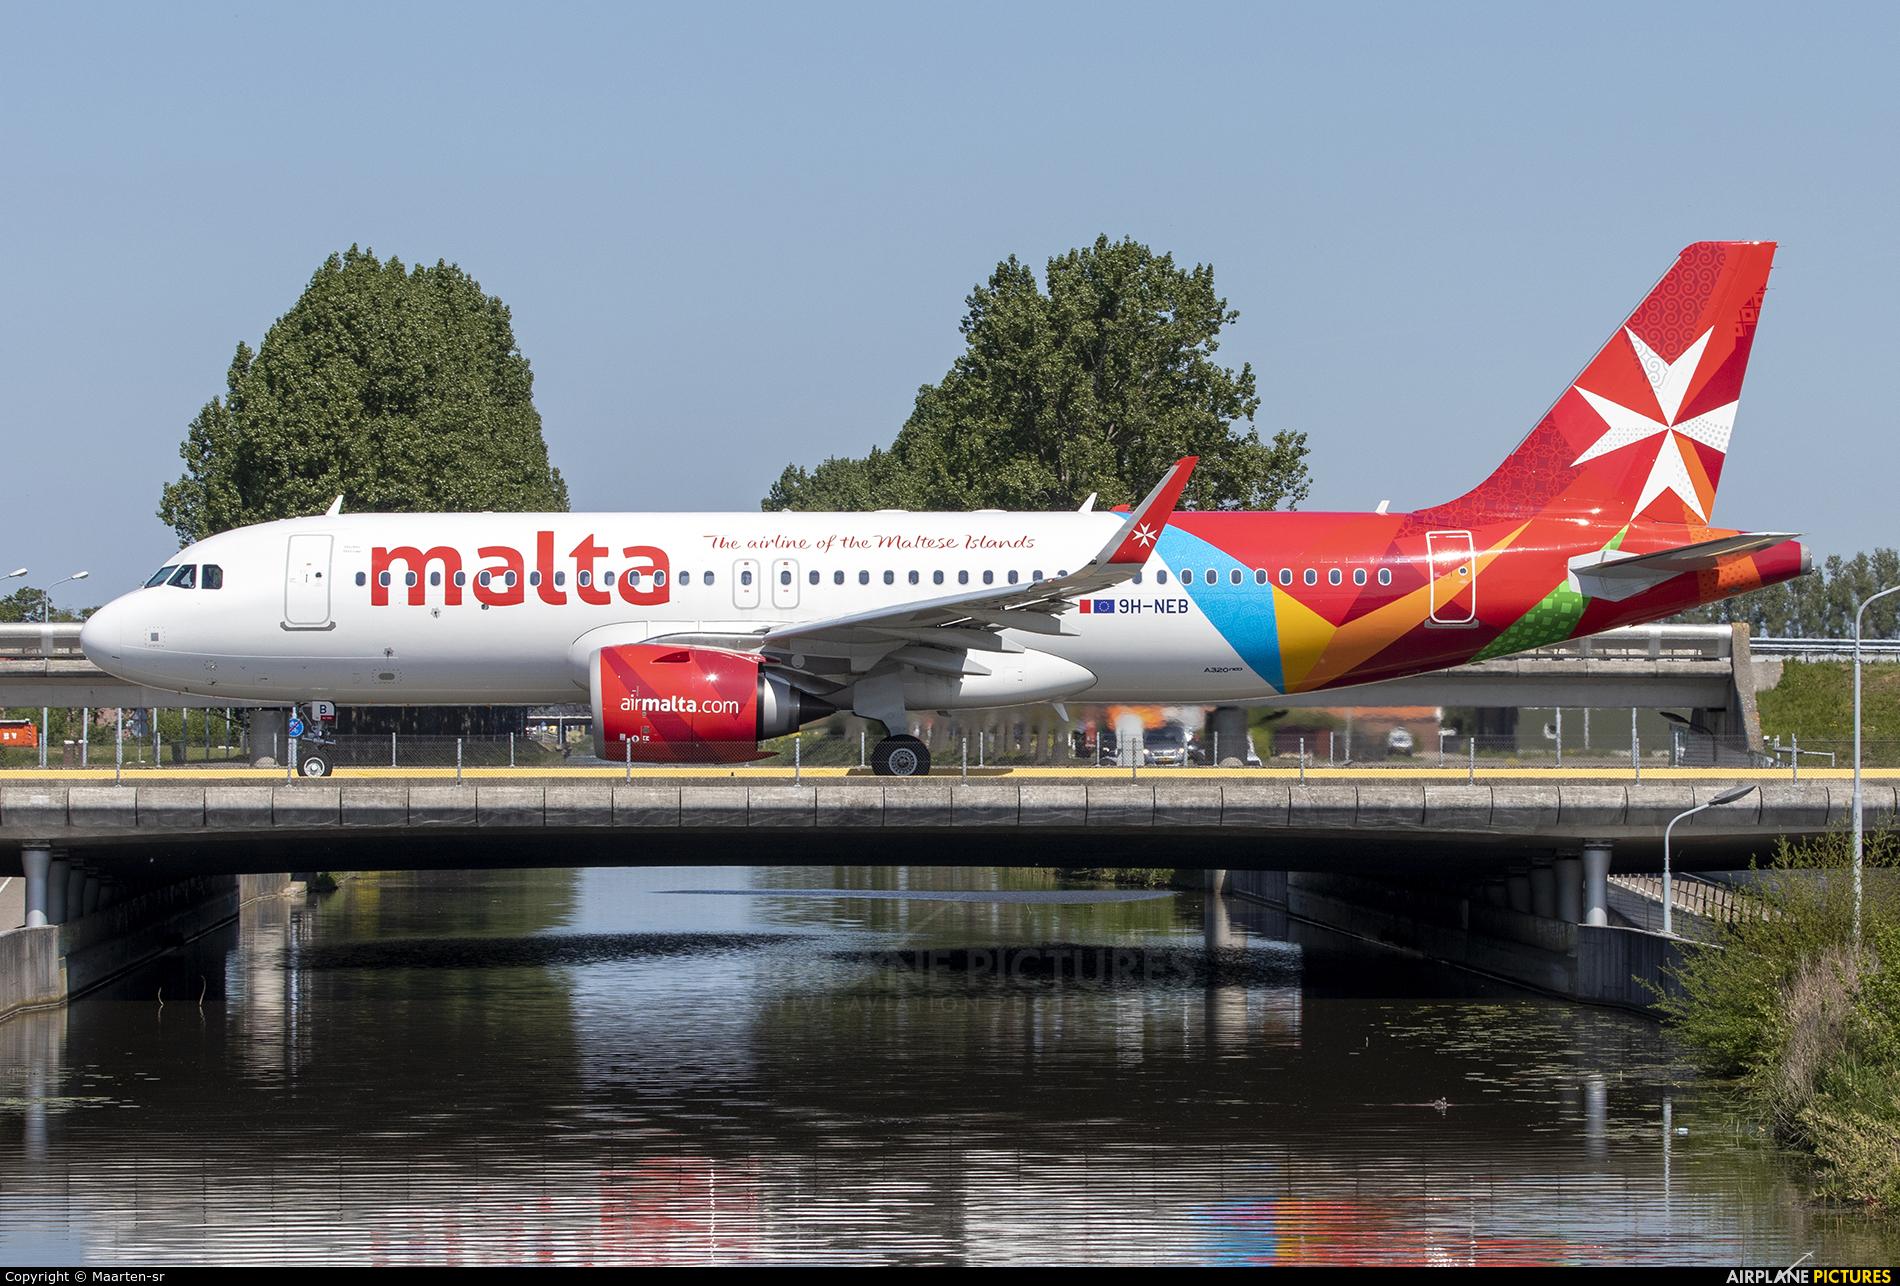 Malta Air 9H-NEB aircraft at Amsterdam - Schiphol